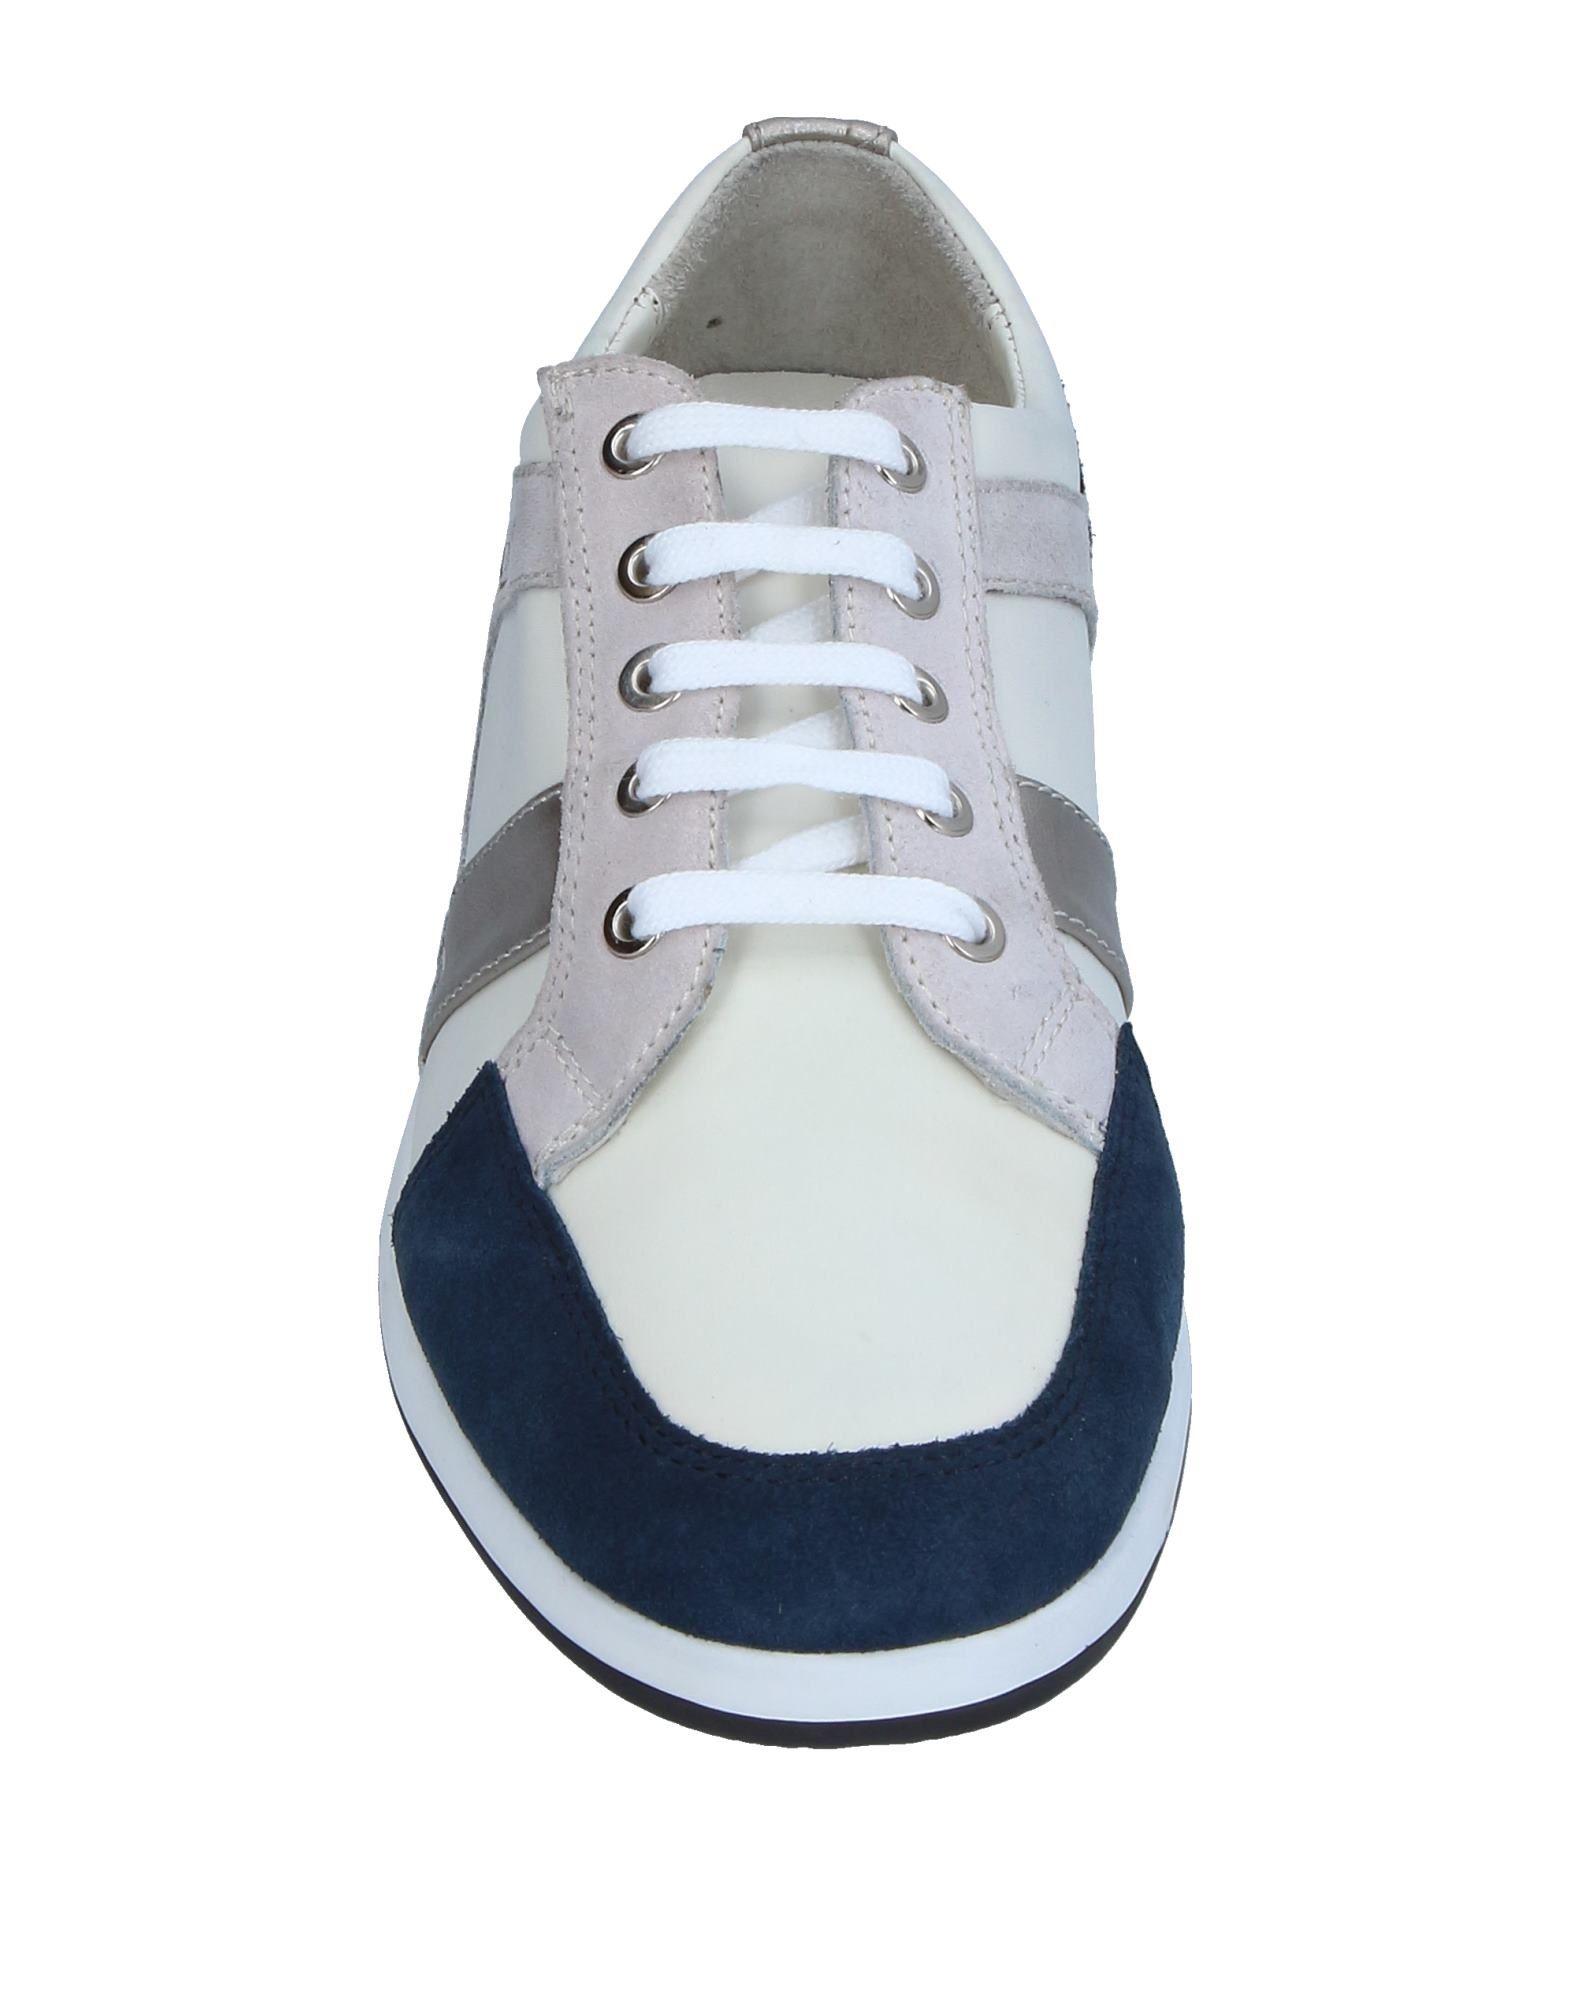 Sneakers Borsalino Femme - Sneakers Borsalino sur